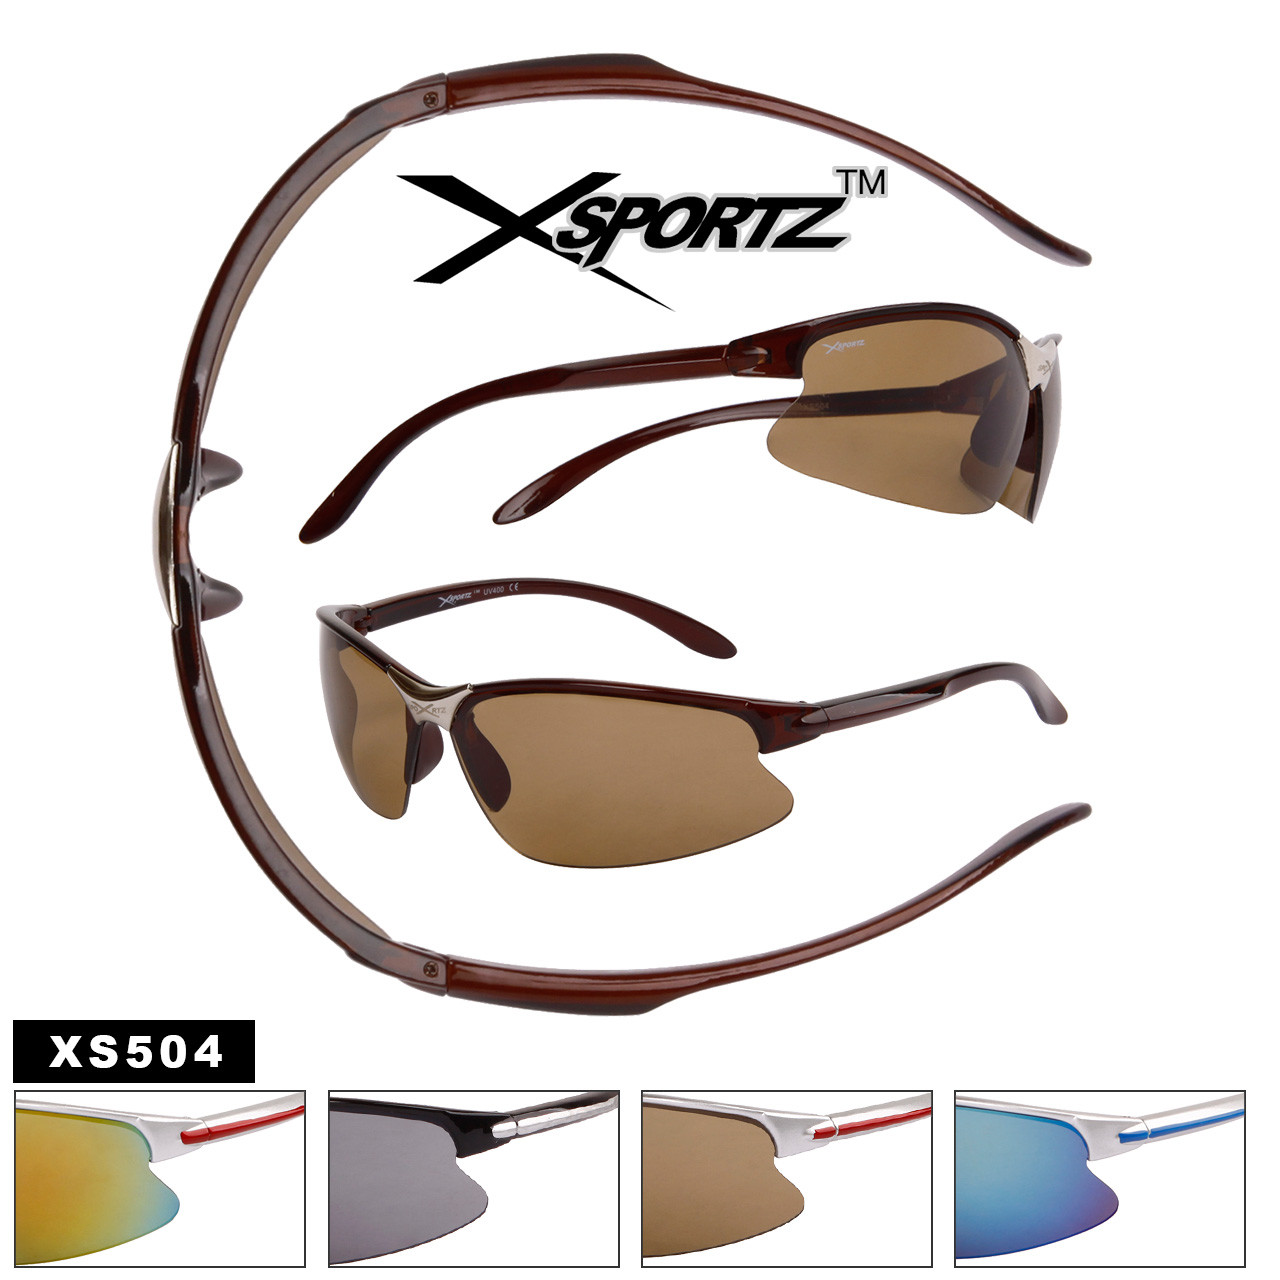 Wholesale Xsportz™ Men's Sport Sunglasses - Style #XS504